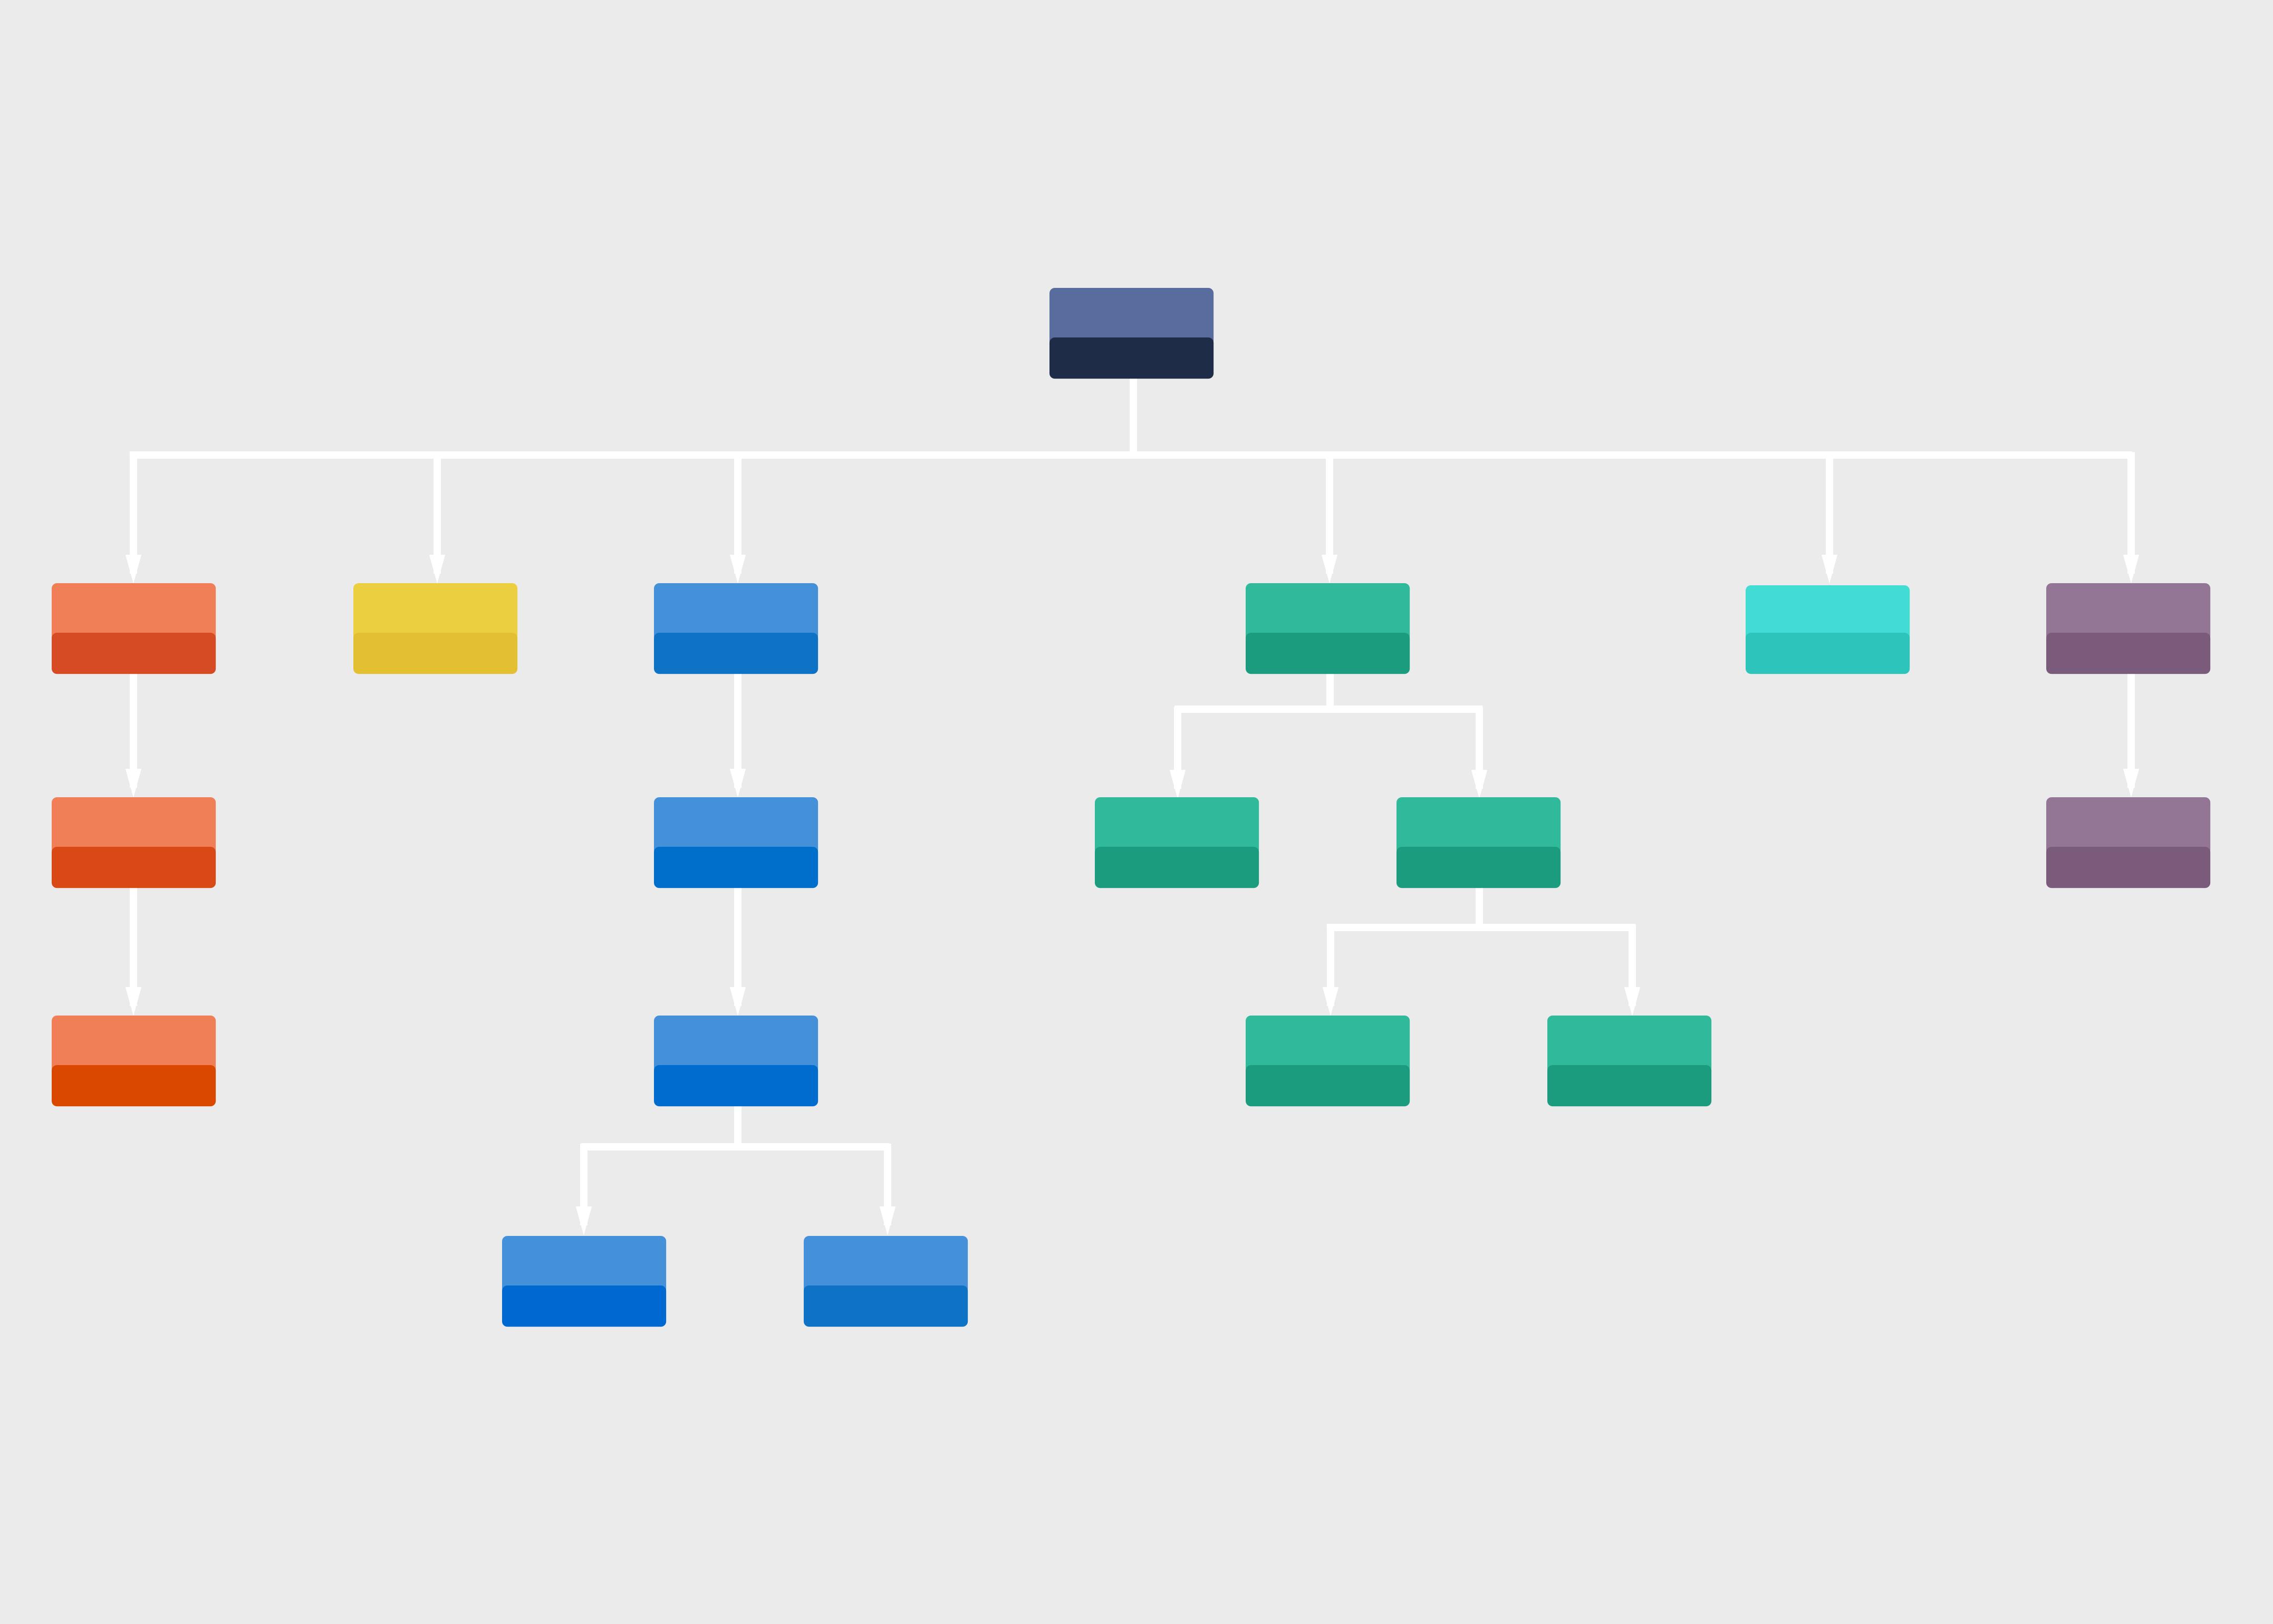 tree-chart-3